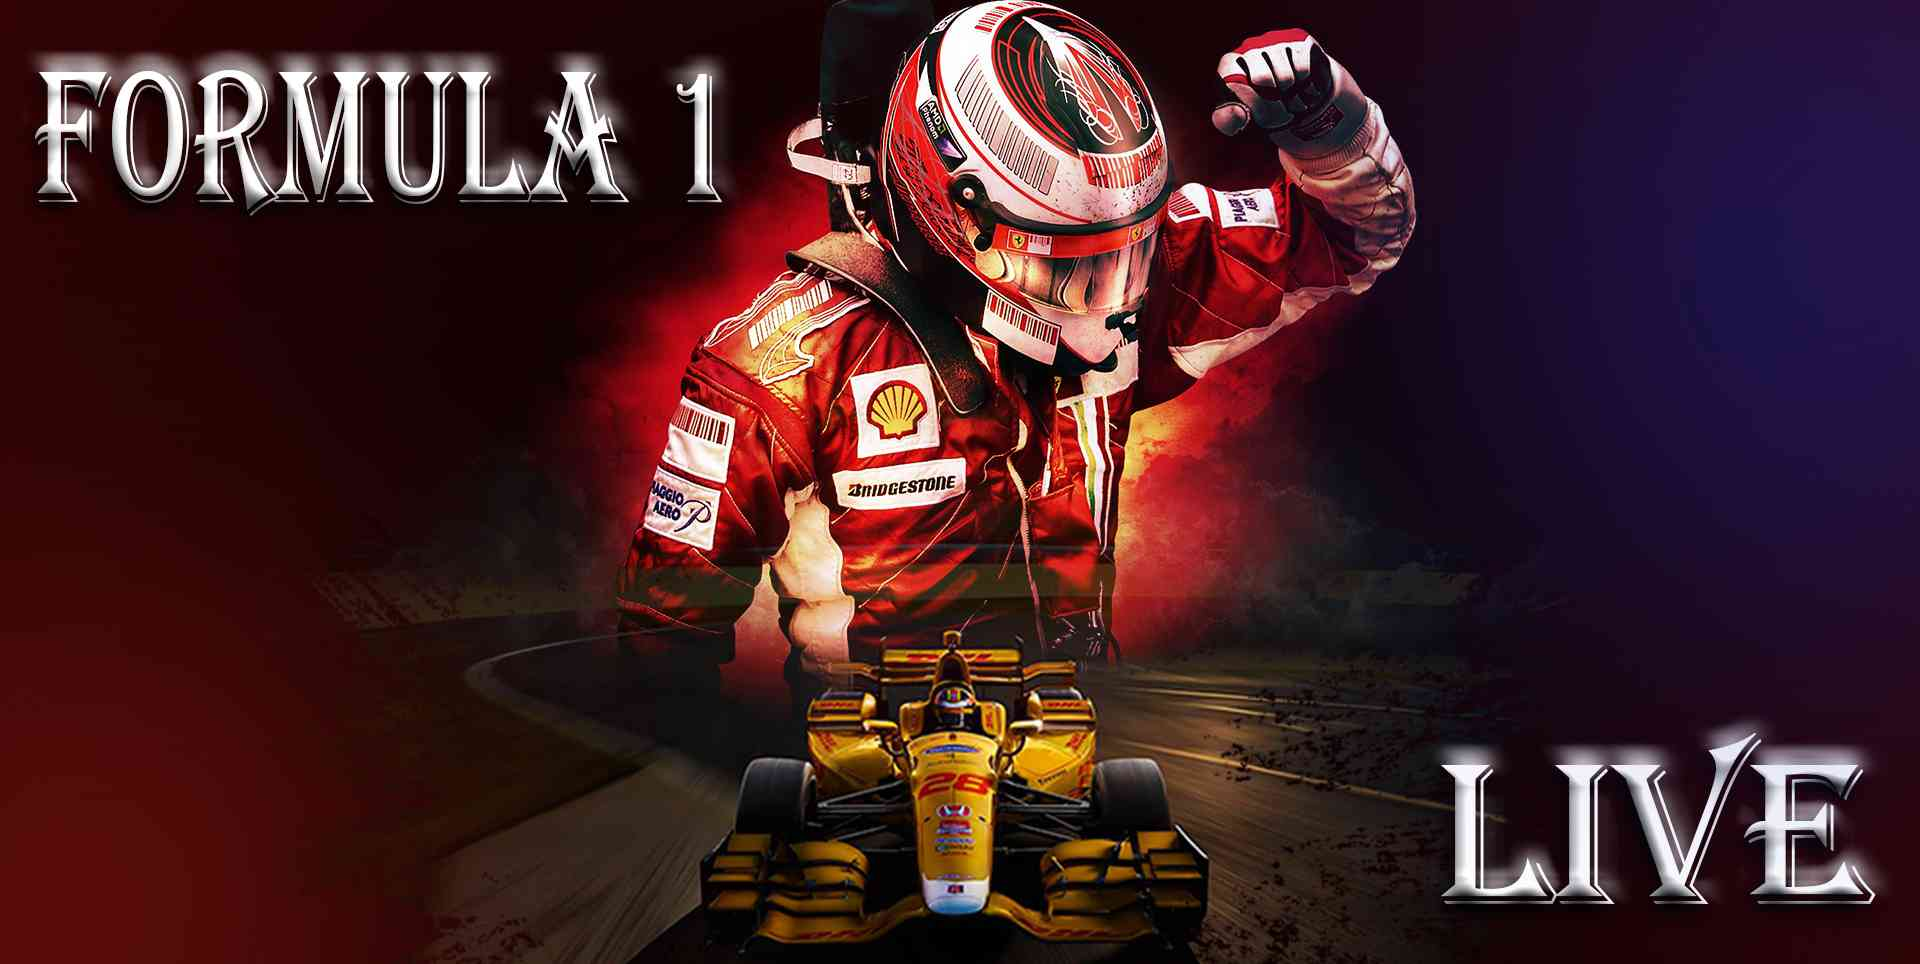 Watching Formula Grand prix Europe Live